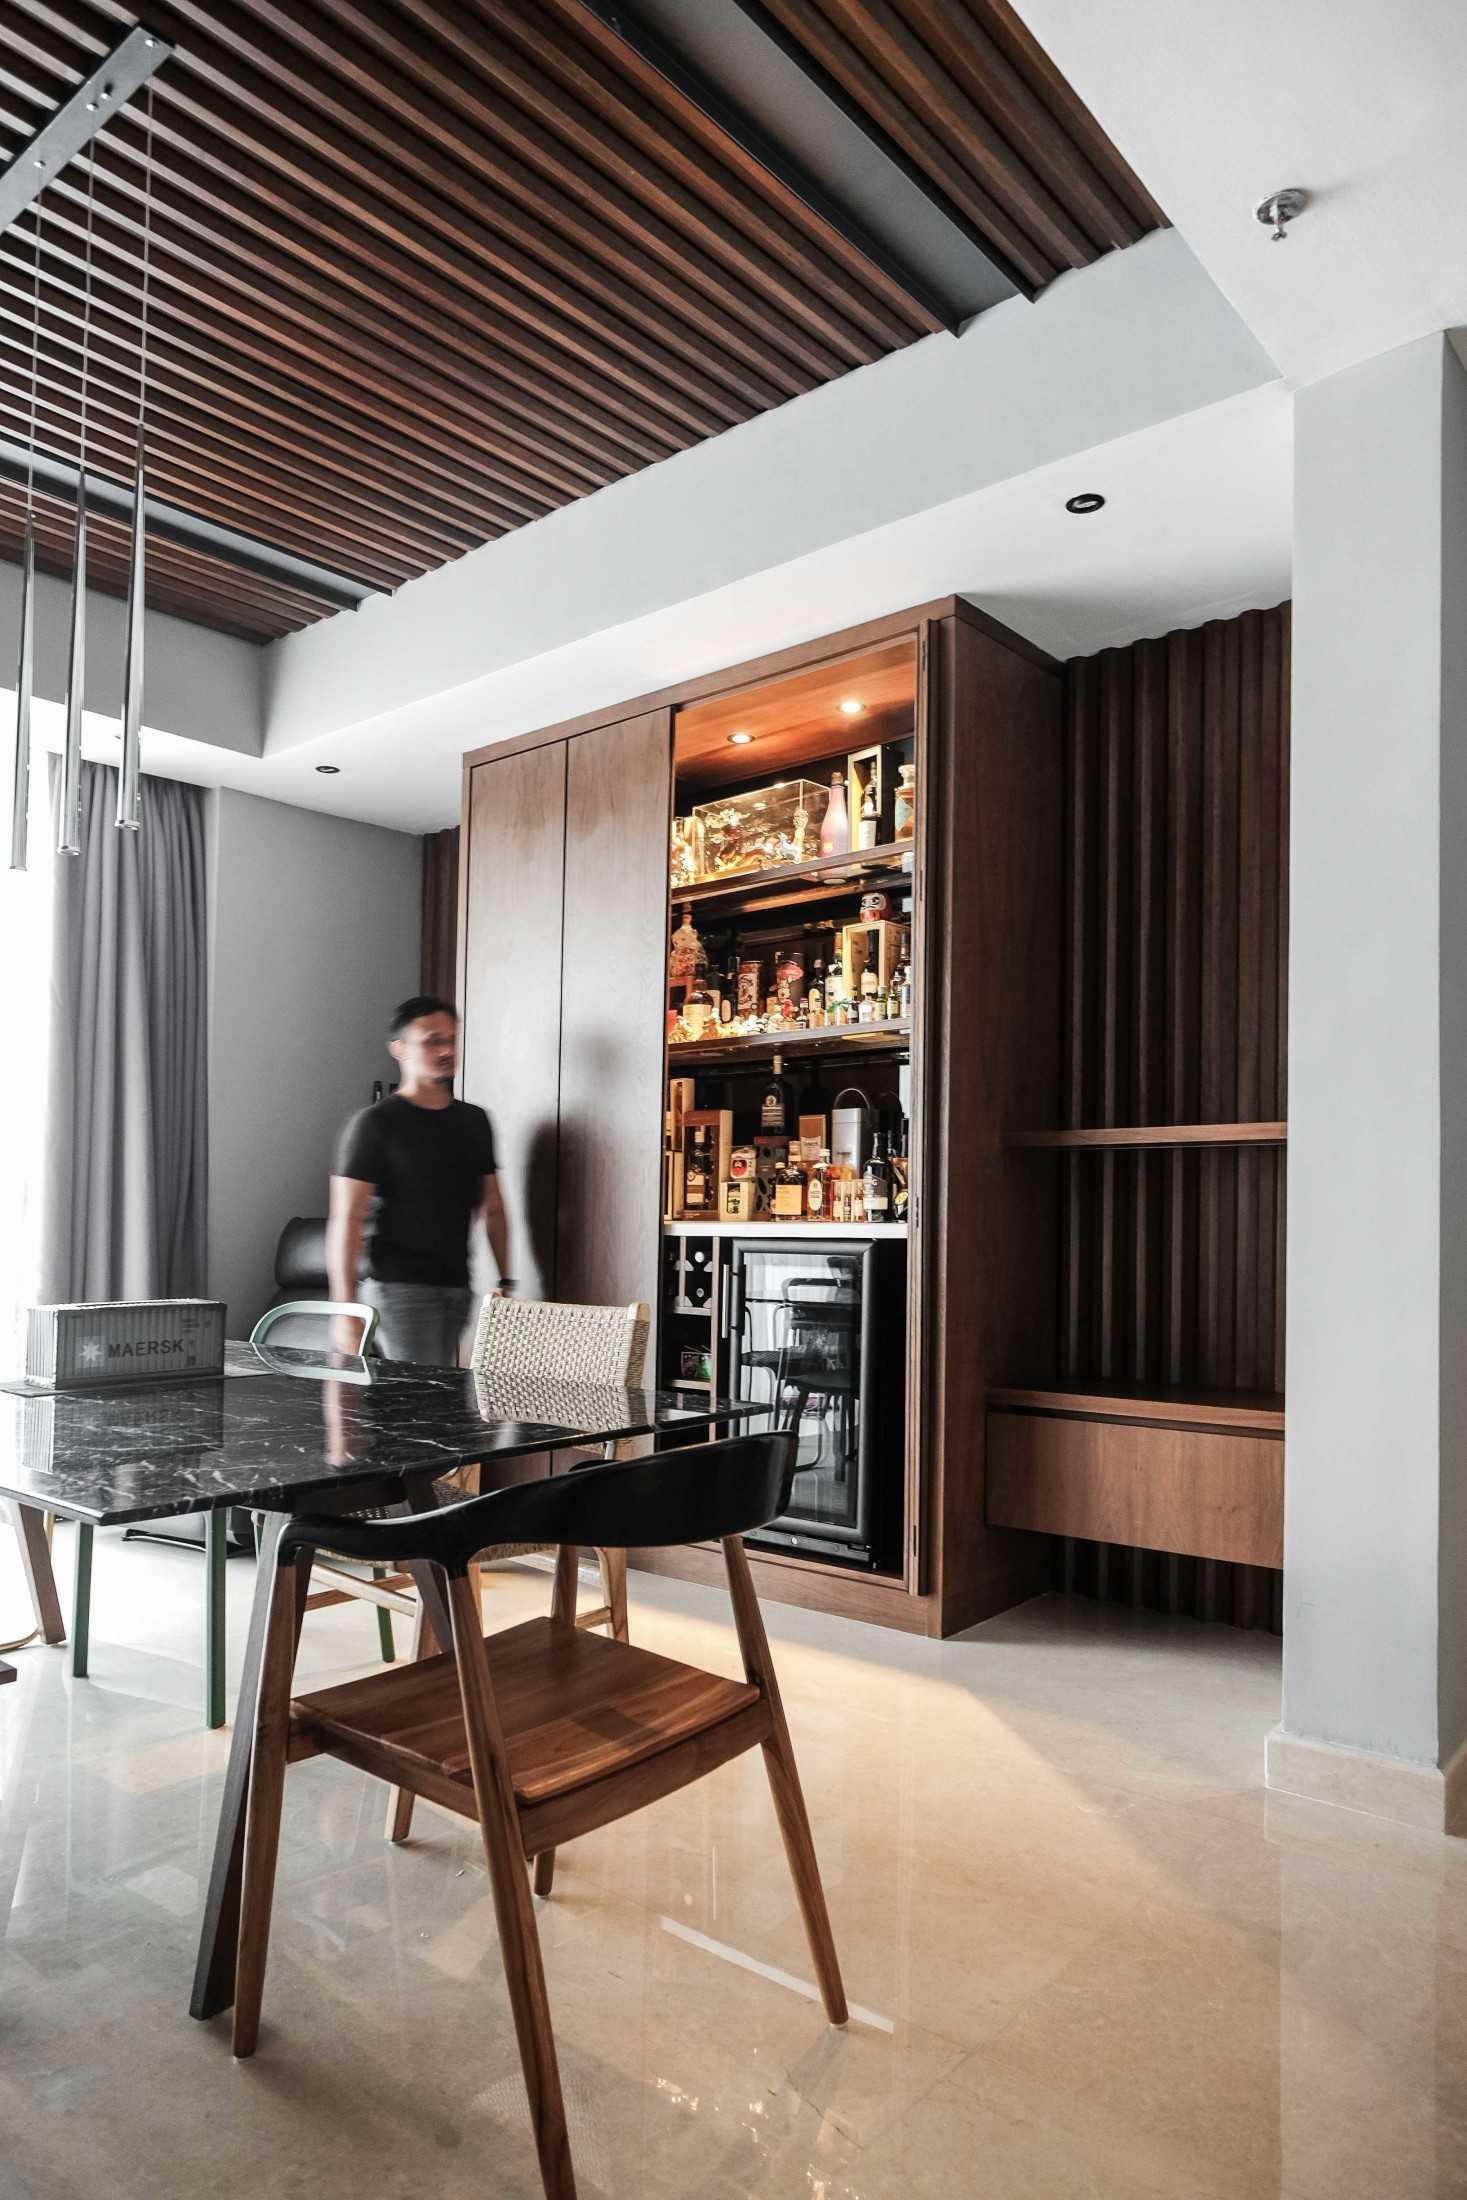 Foto inspirasi ide desain apartemen industrial Dining area oleh FIANO di Arsitag